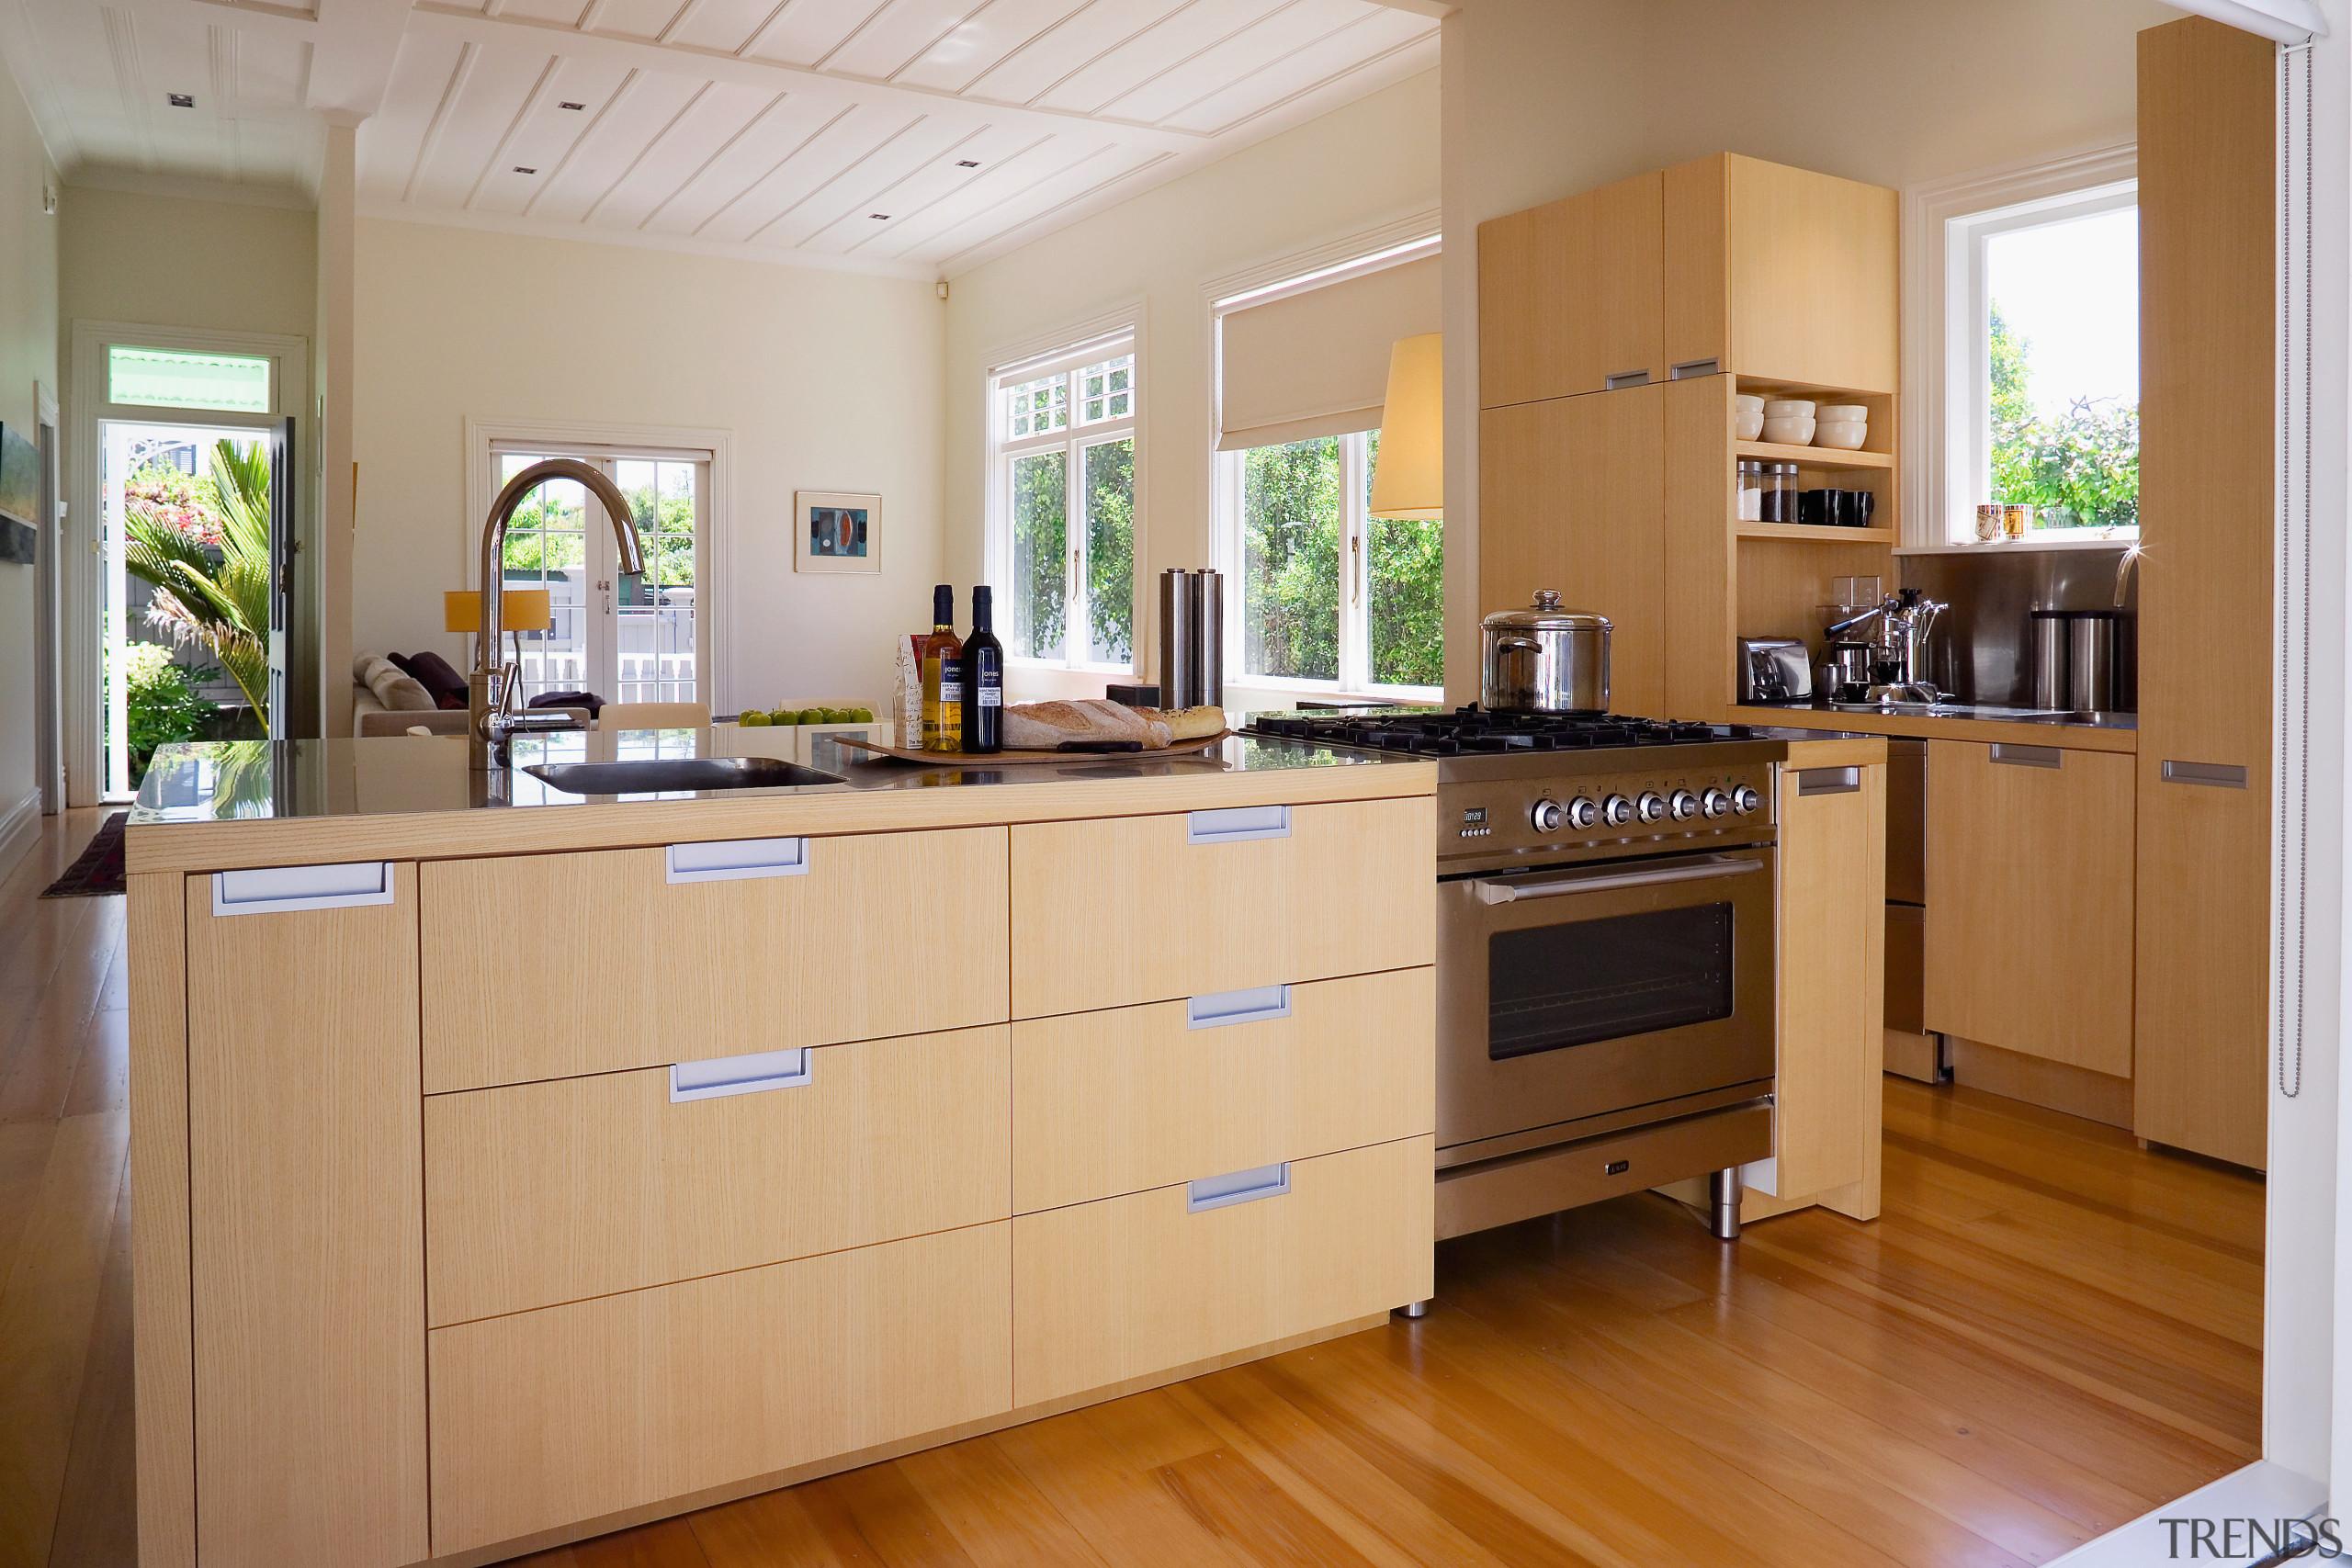 A view of the kitchen area, wooden flooring cabinetry, countertop, floor, flooring, interior design, kitchen, room, brown, orange